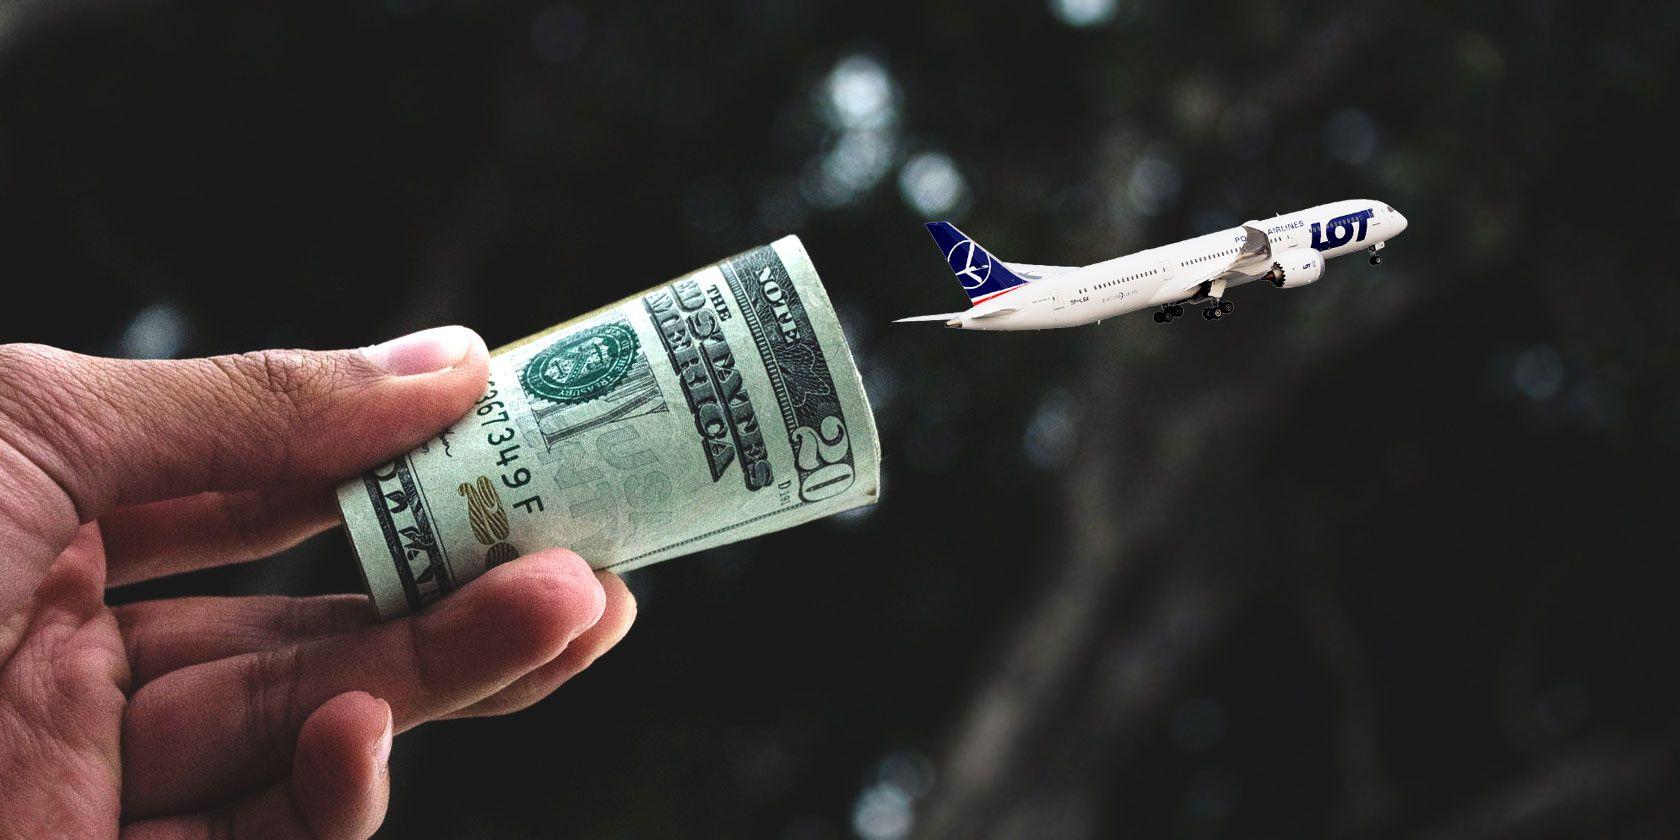 29f31a7a6262c68a0bed88a97bfcc189 - Use Vpn To Buy Plane Tickets